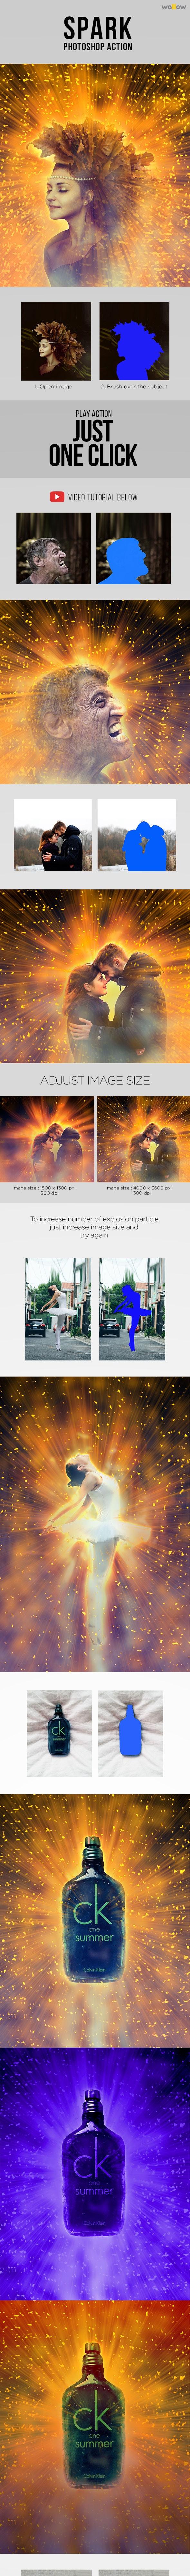 Spark Photoshop Action - Actions Photoshop